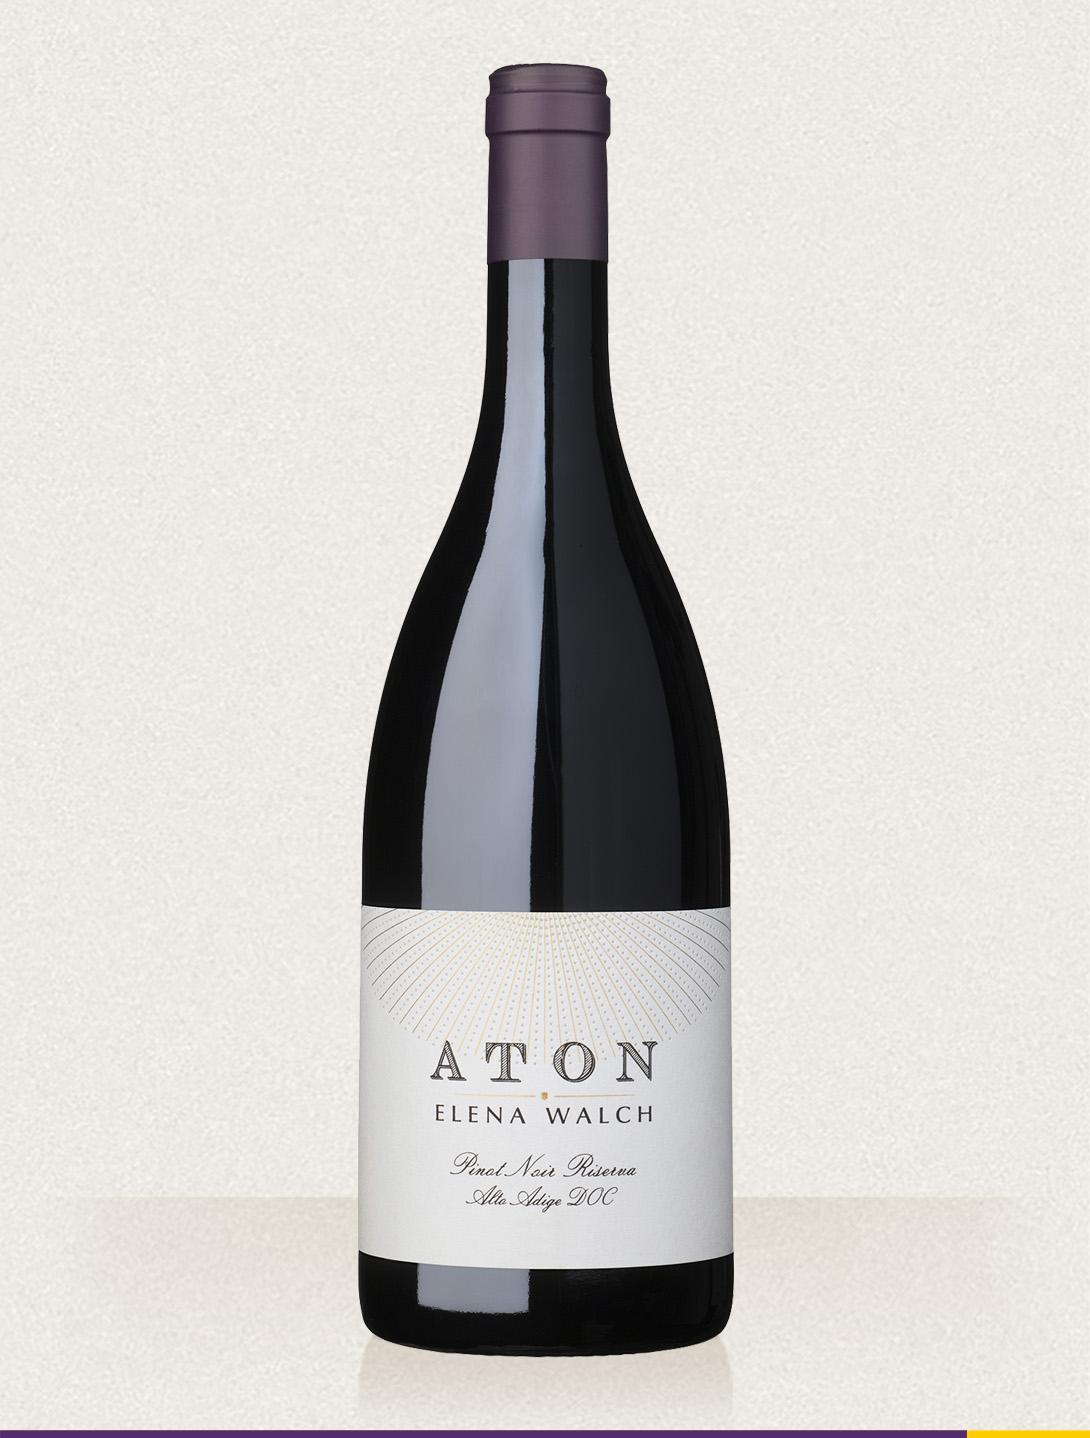 """Aton"" Pinot Noir Riserva"